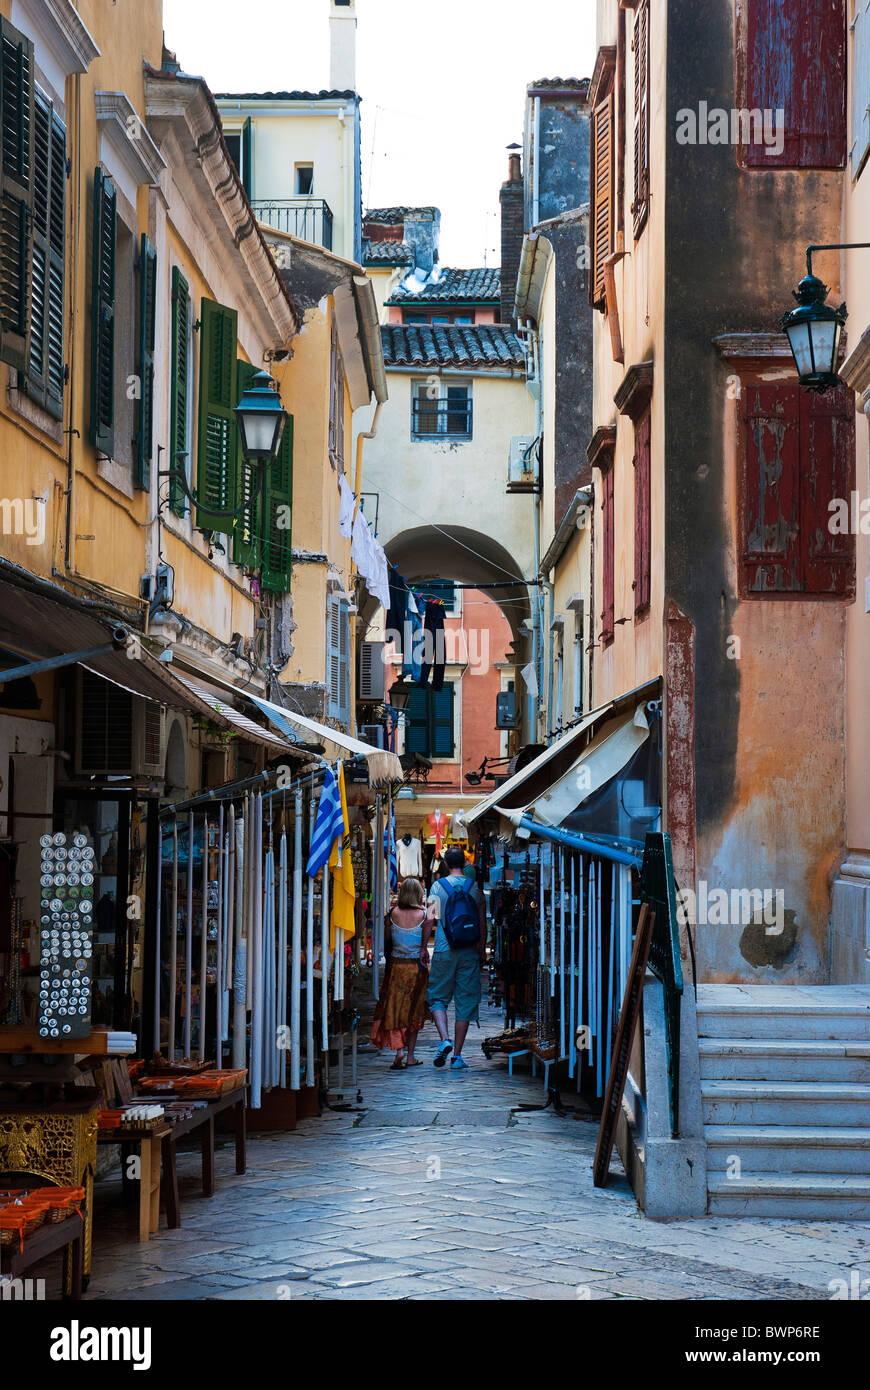 A backstreet in Corfu Town, Ionian Islands Greece. - Stock Image